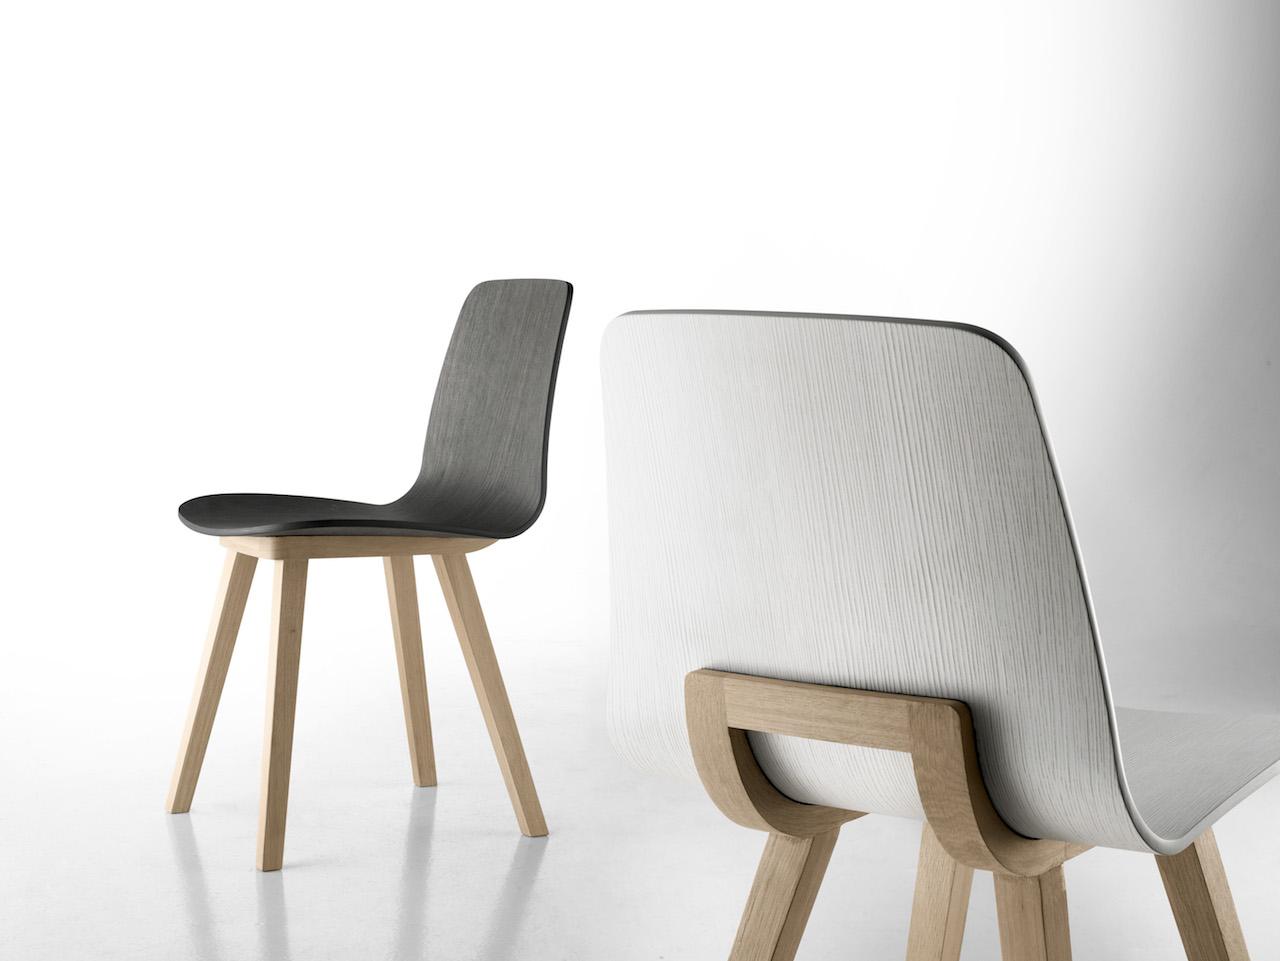 Kuskoa la sedia perfetta con la seduta biodegradabile for Sedia scandinava